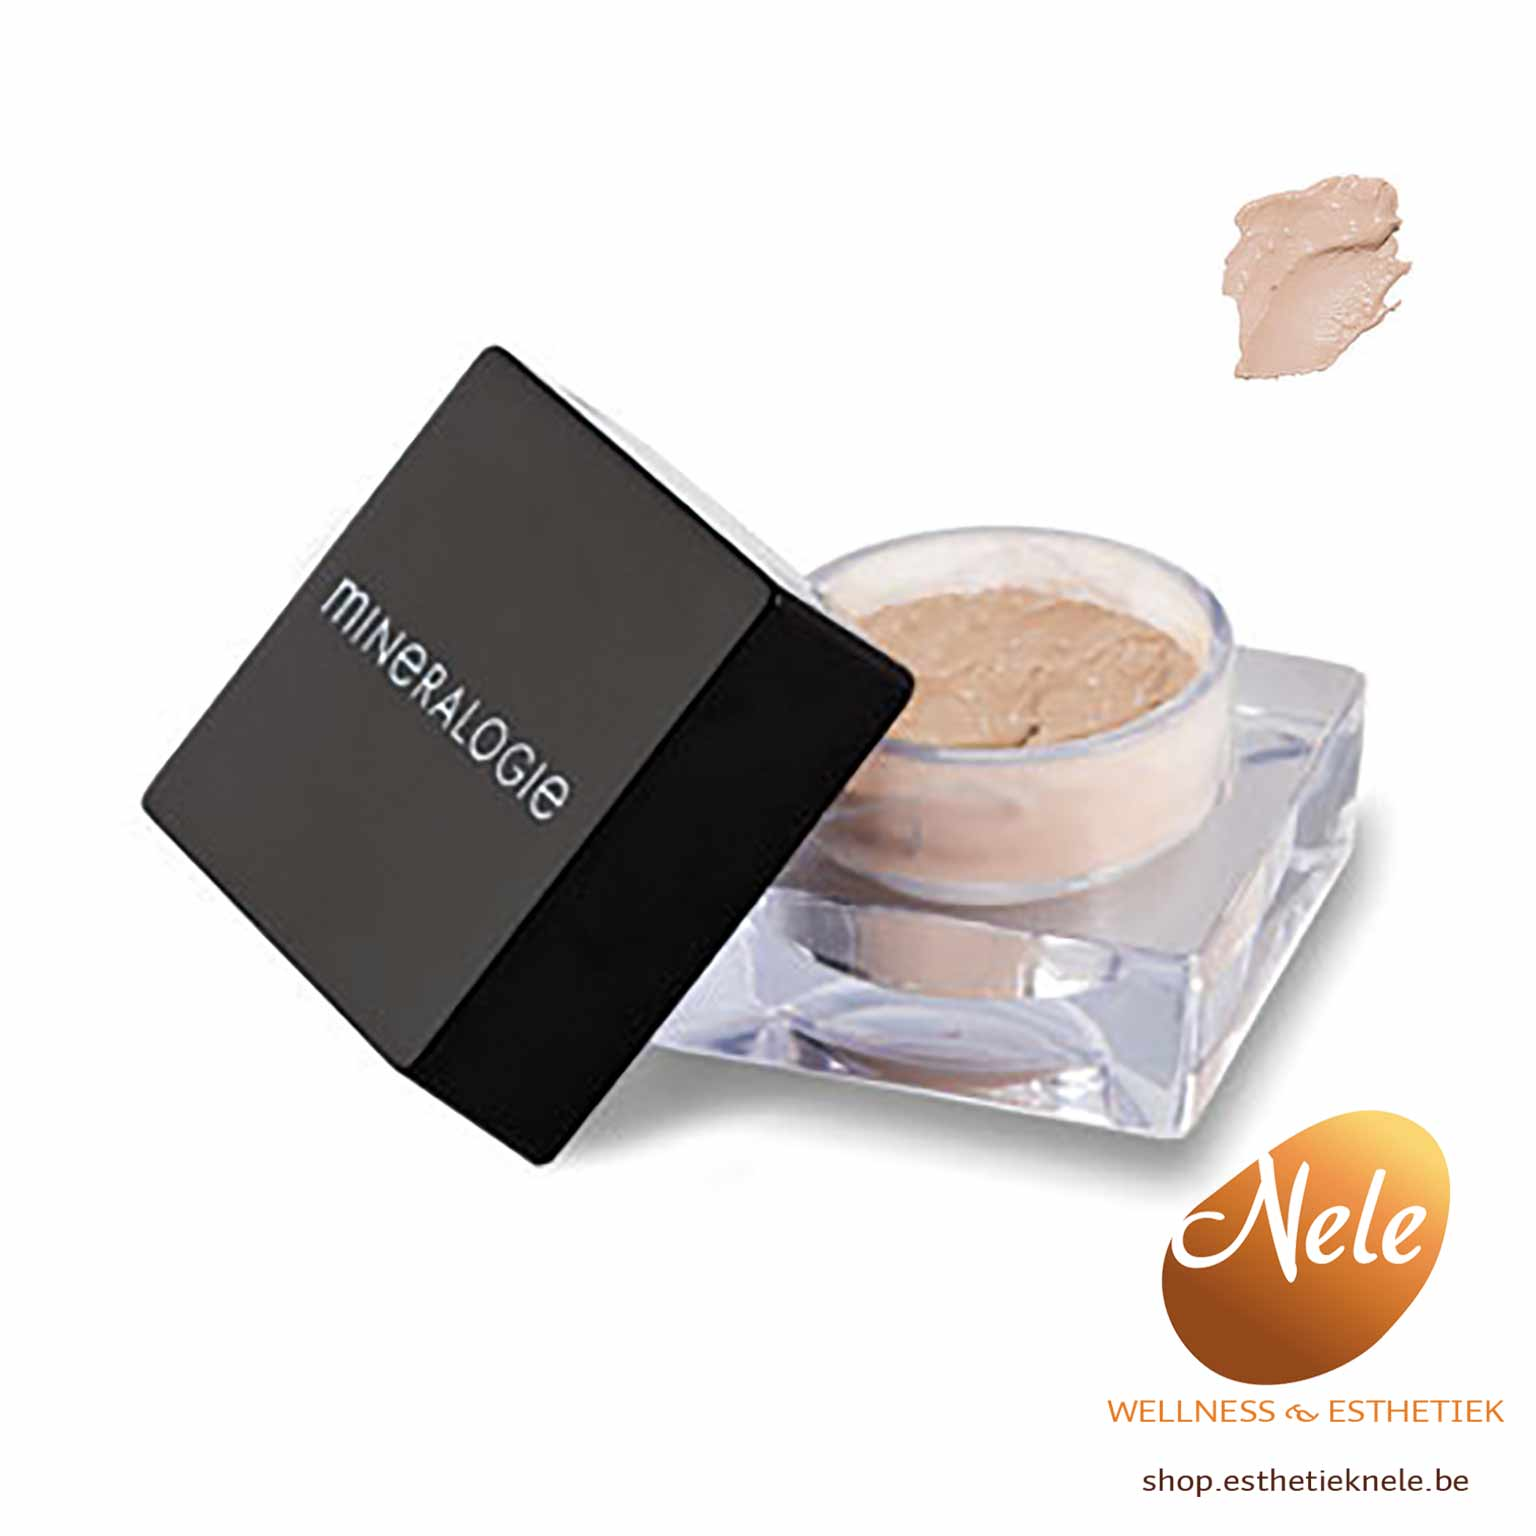 Mineralogie make-up eye shadow primer Wellness Esthetiek Nele